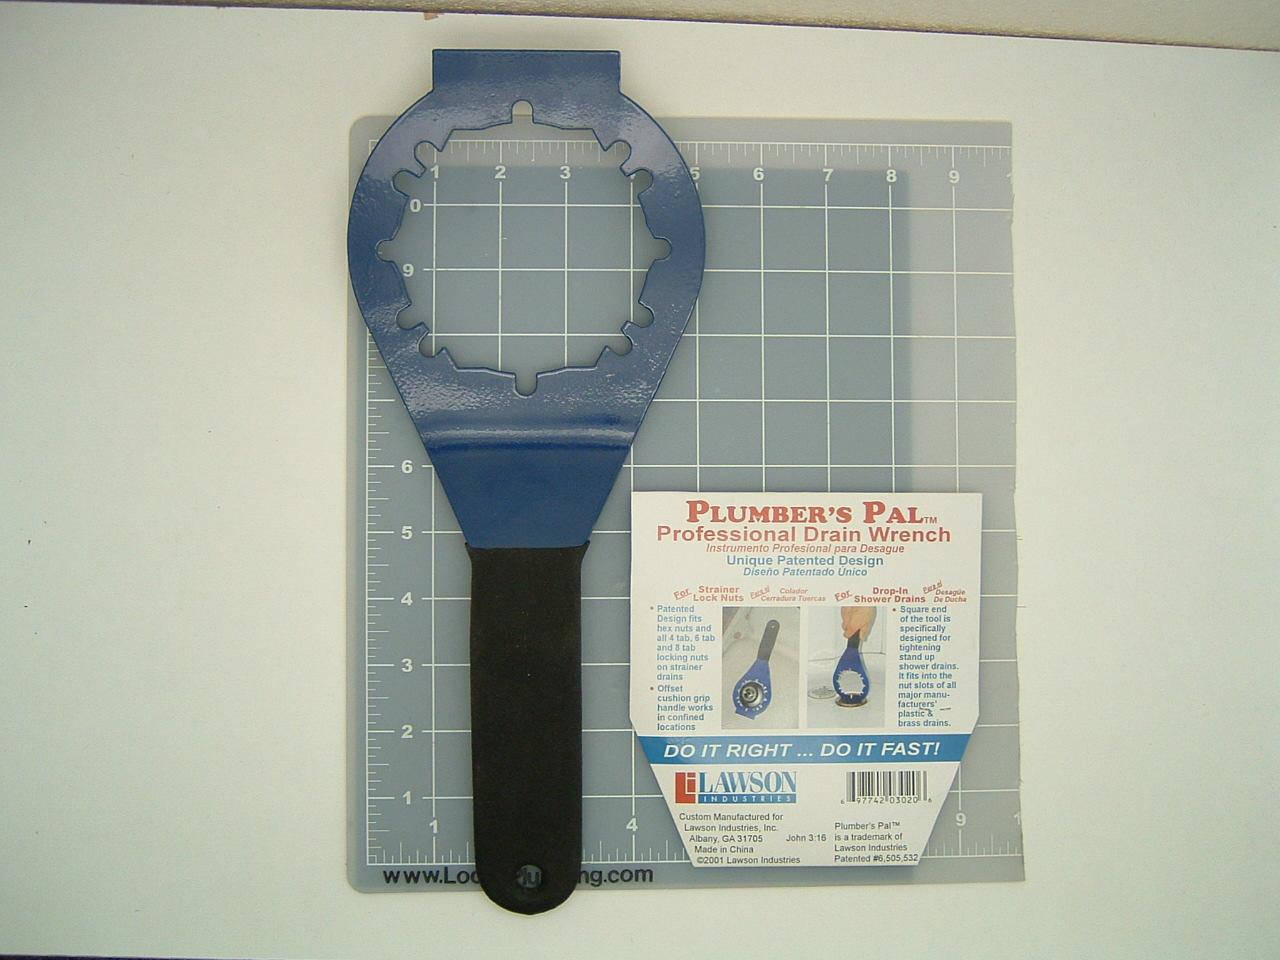 Plumber S Pal Professional Drain Wrench Locke Plumbing